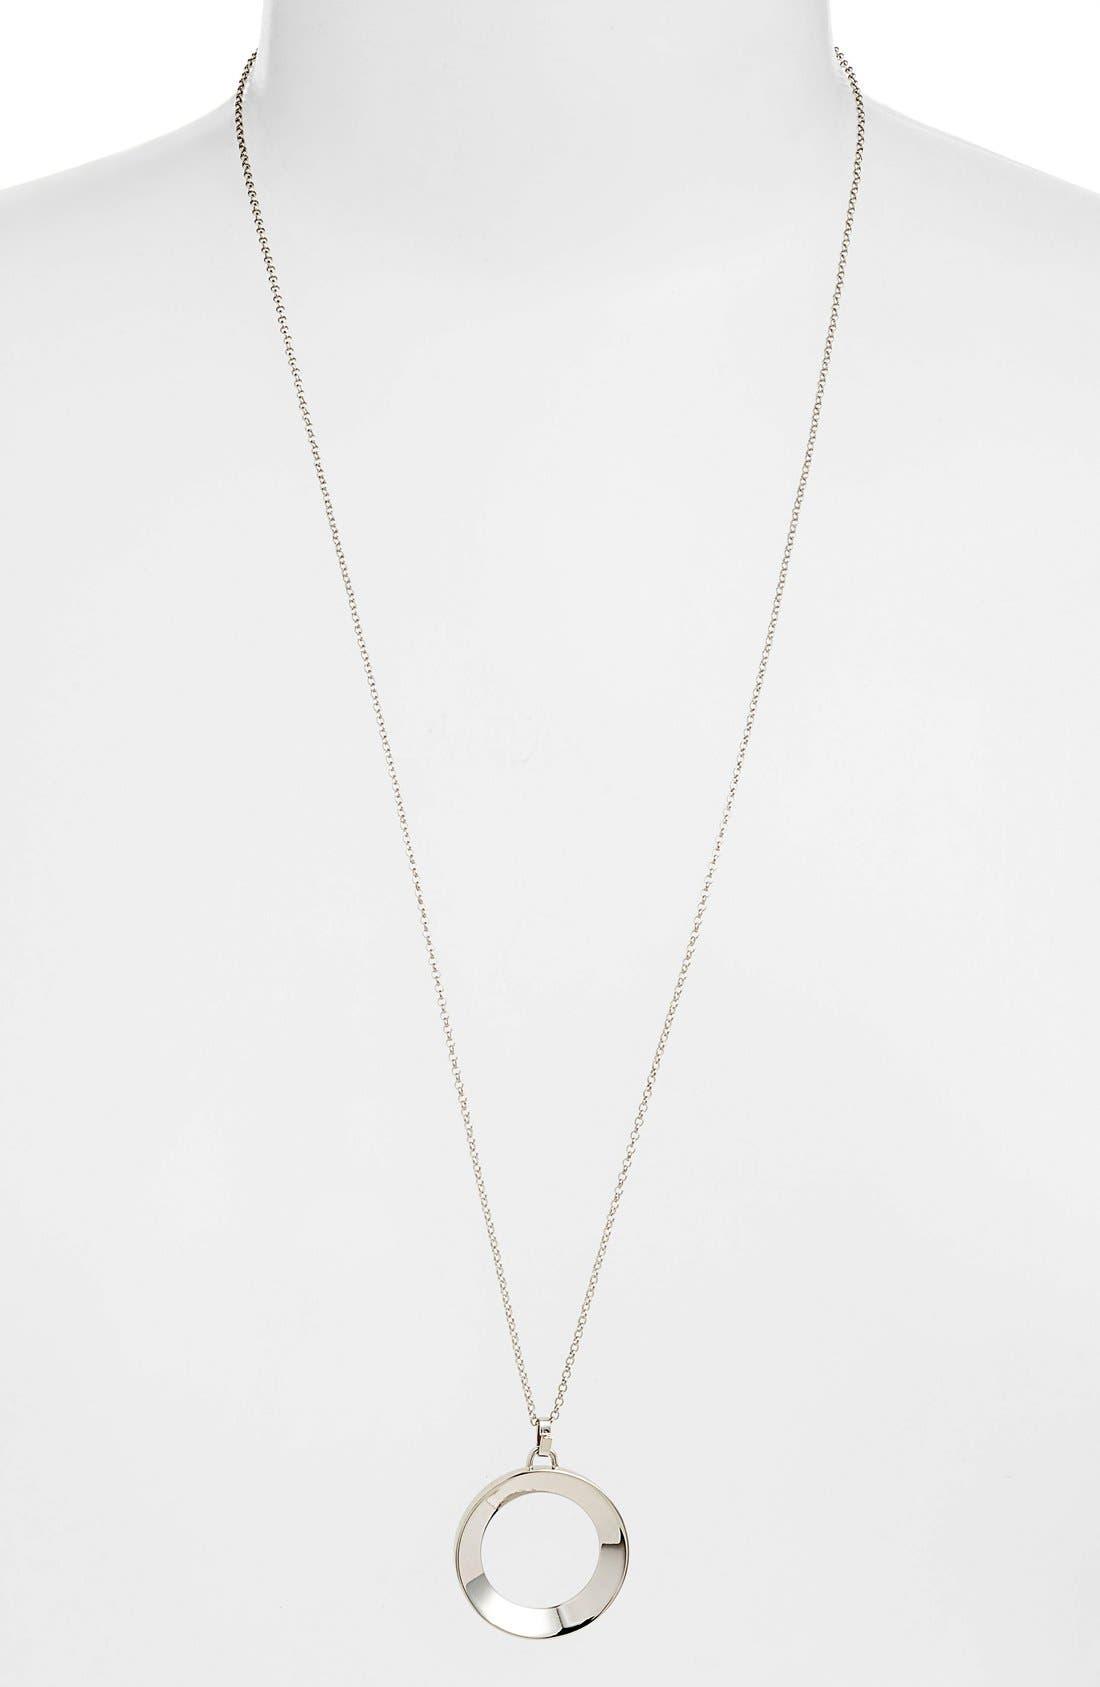 VITA FEDE,                             Cosimo Pendant Necklace,                             Alternate thumbnail 2, color,                             040